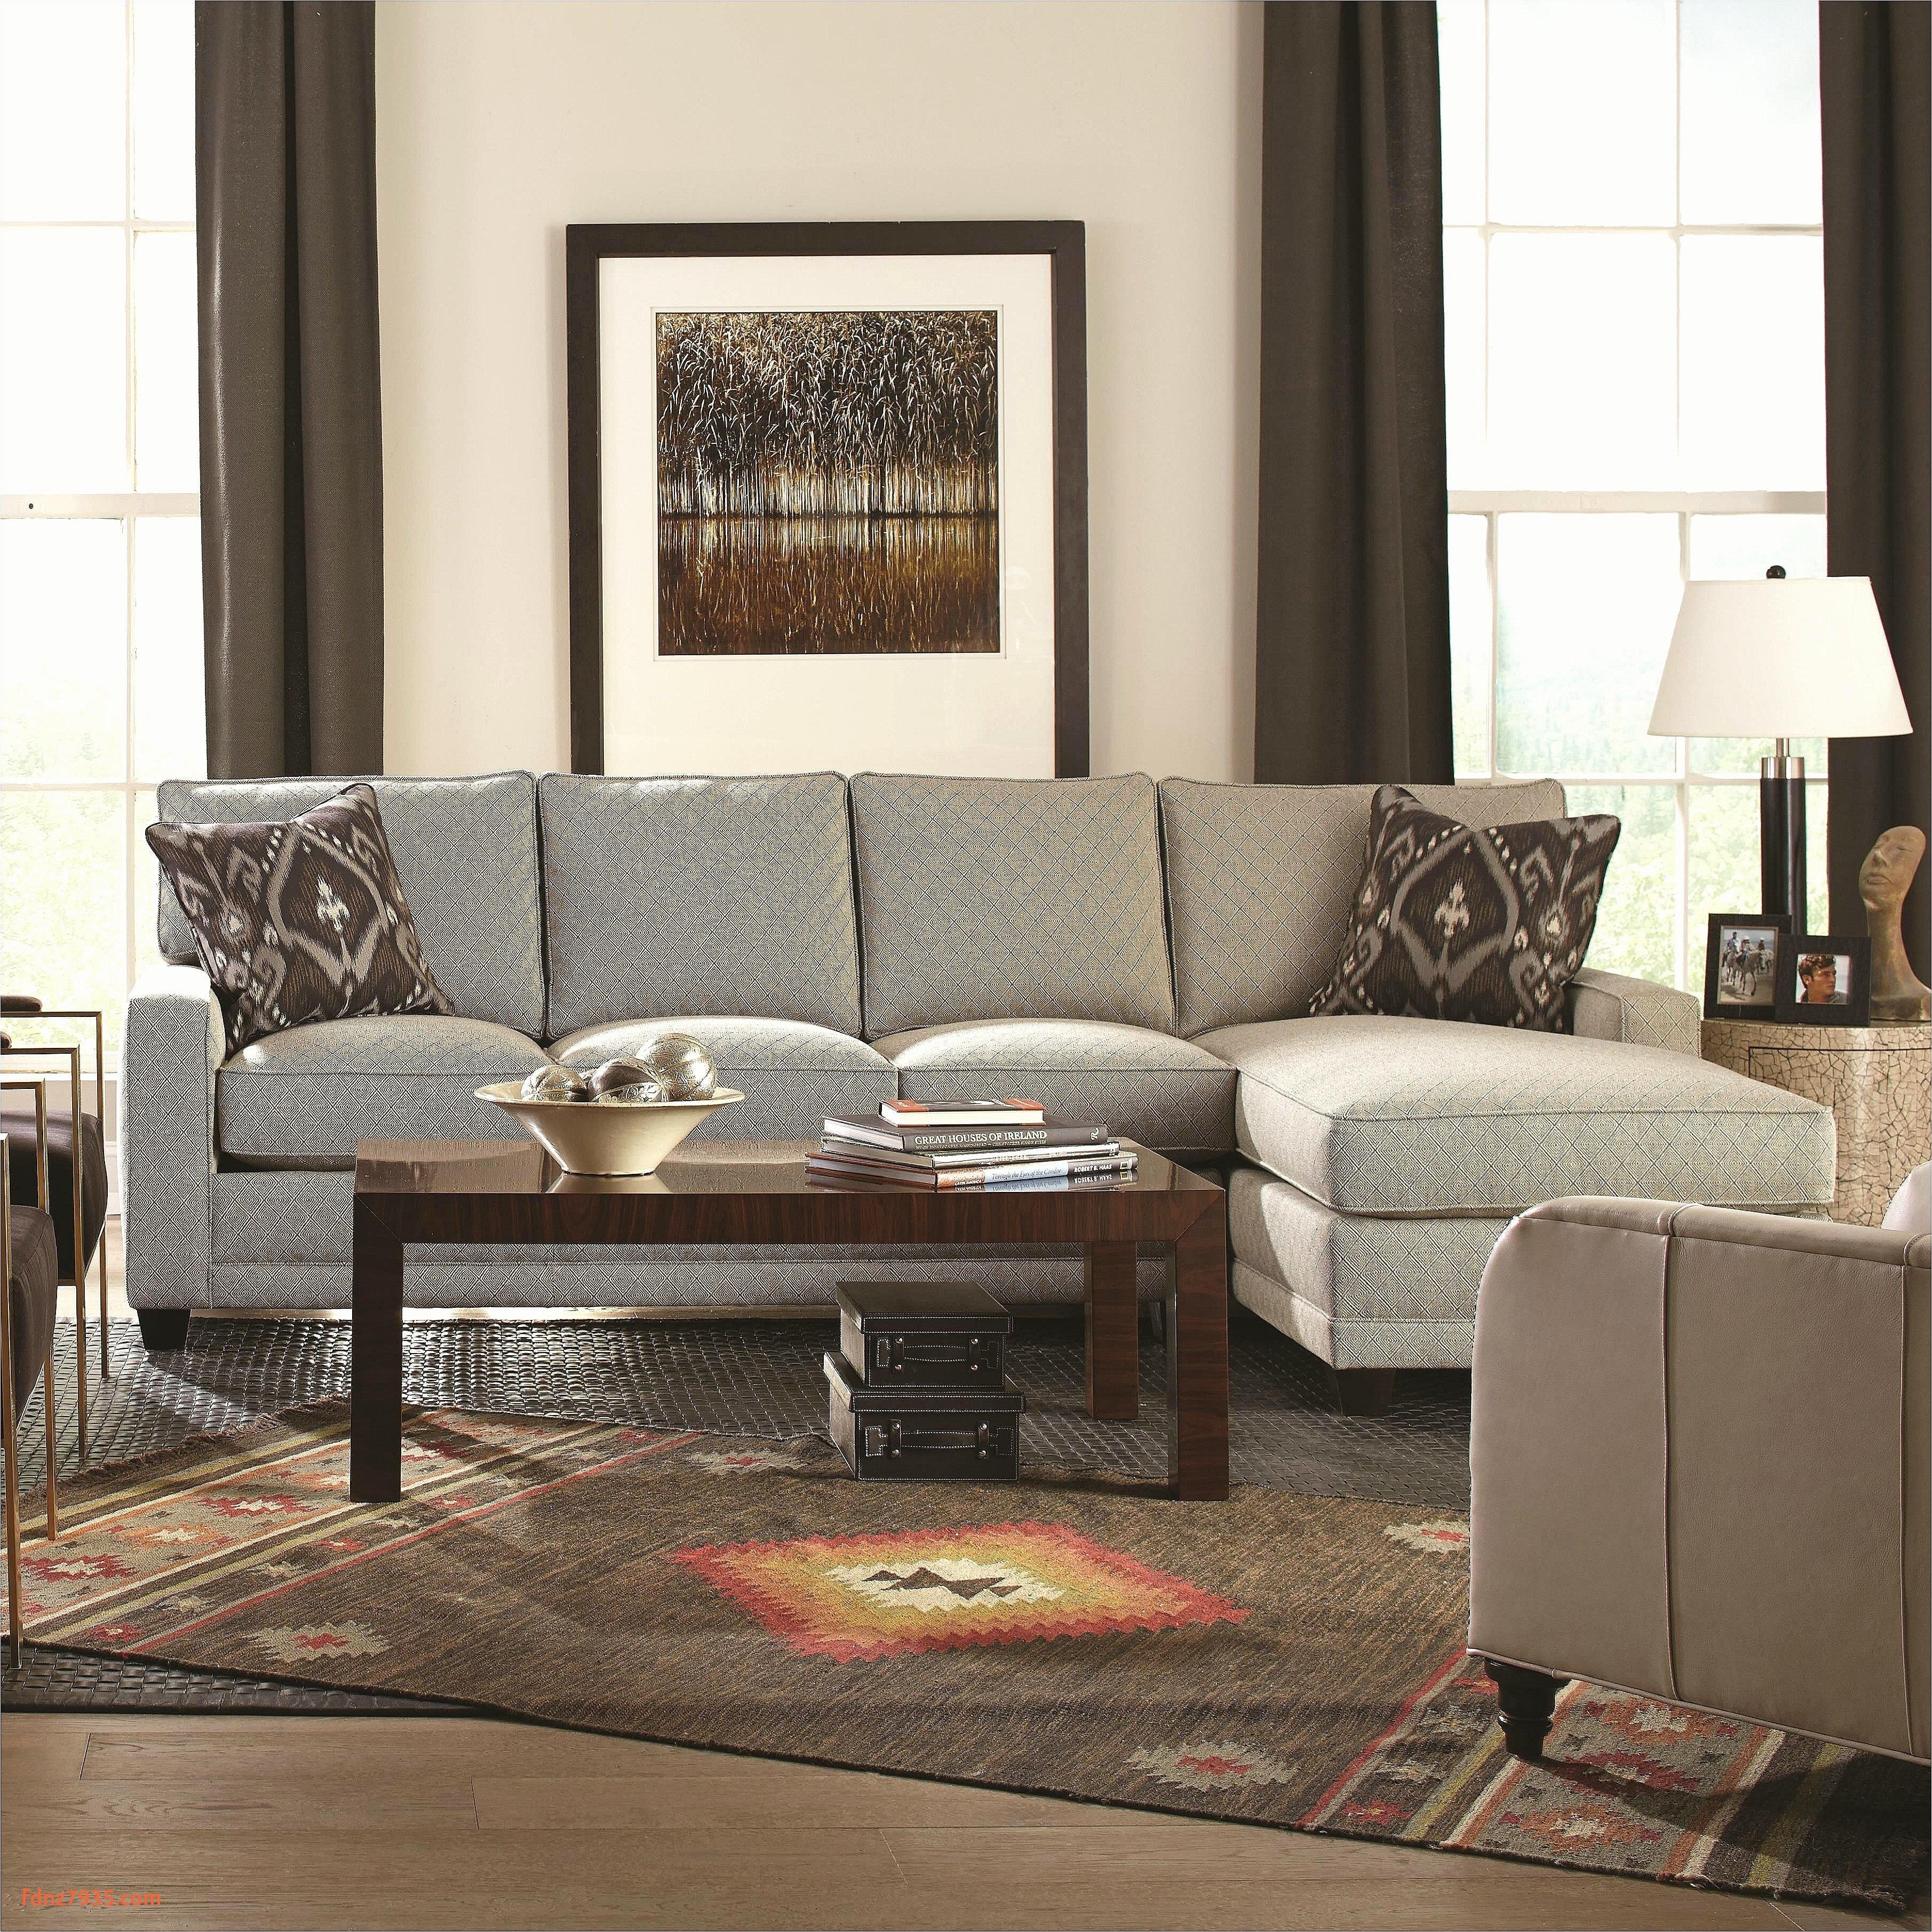 modern living room furniture new gunstige sofa macys furniture 0d design contemporary living room furniture